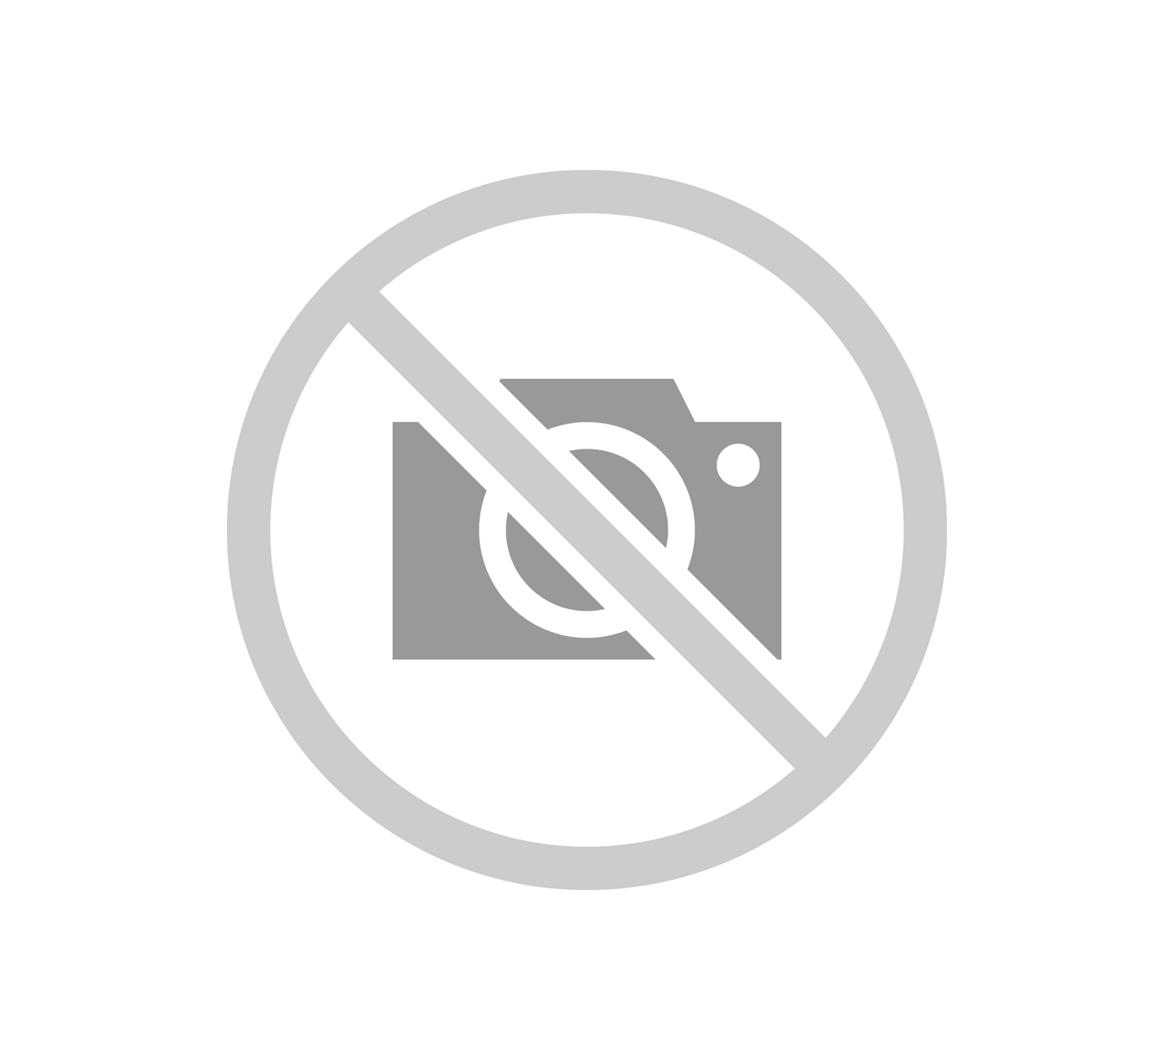 Postel MEADOW 200x180 cm vč. roštu a matrace  dub sonoma